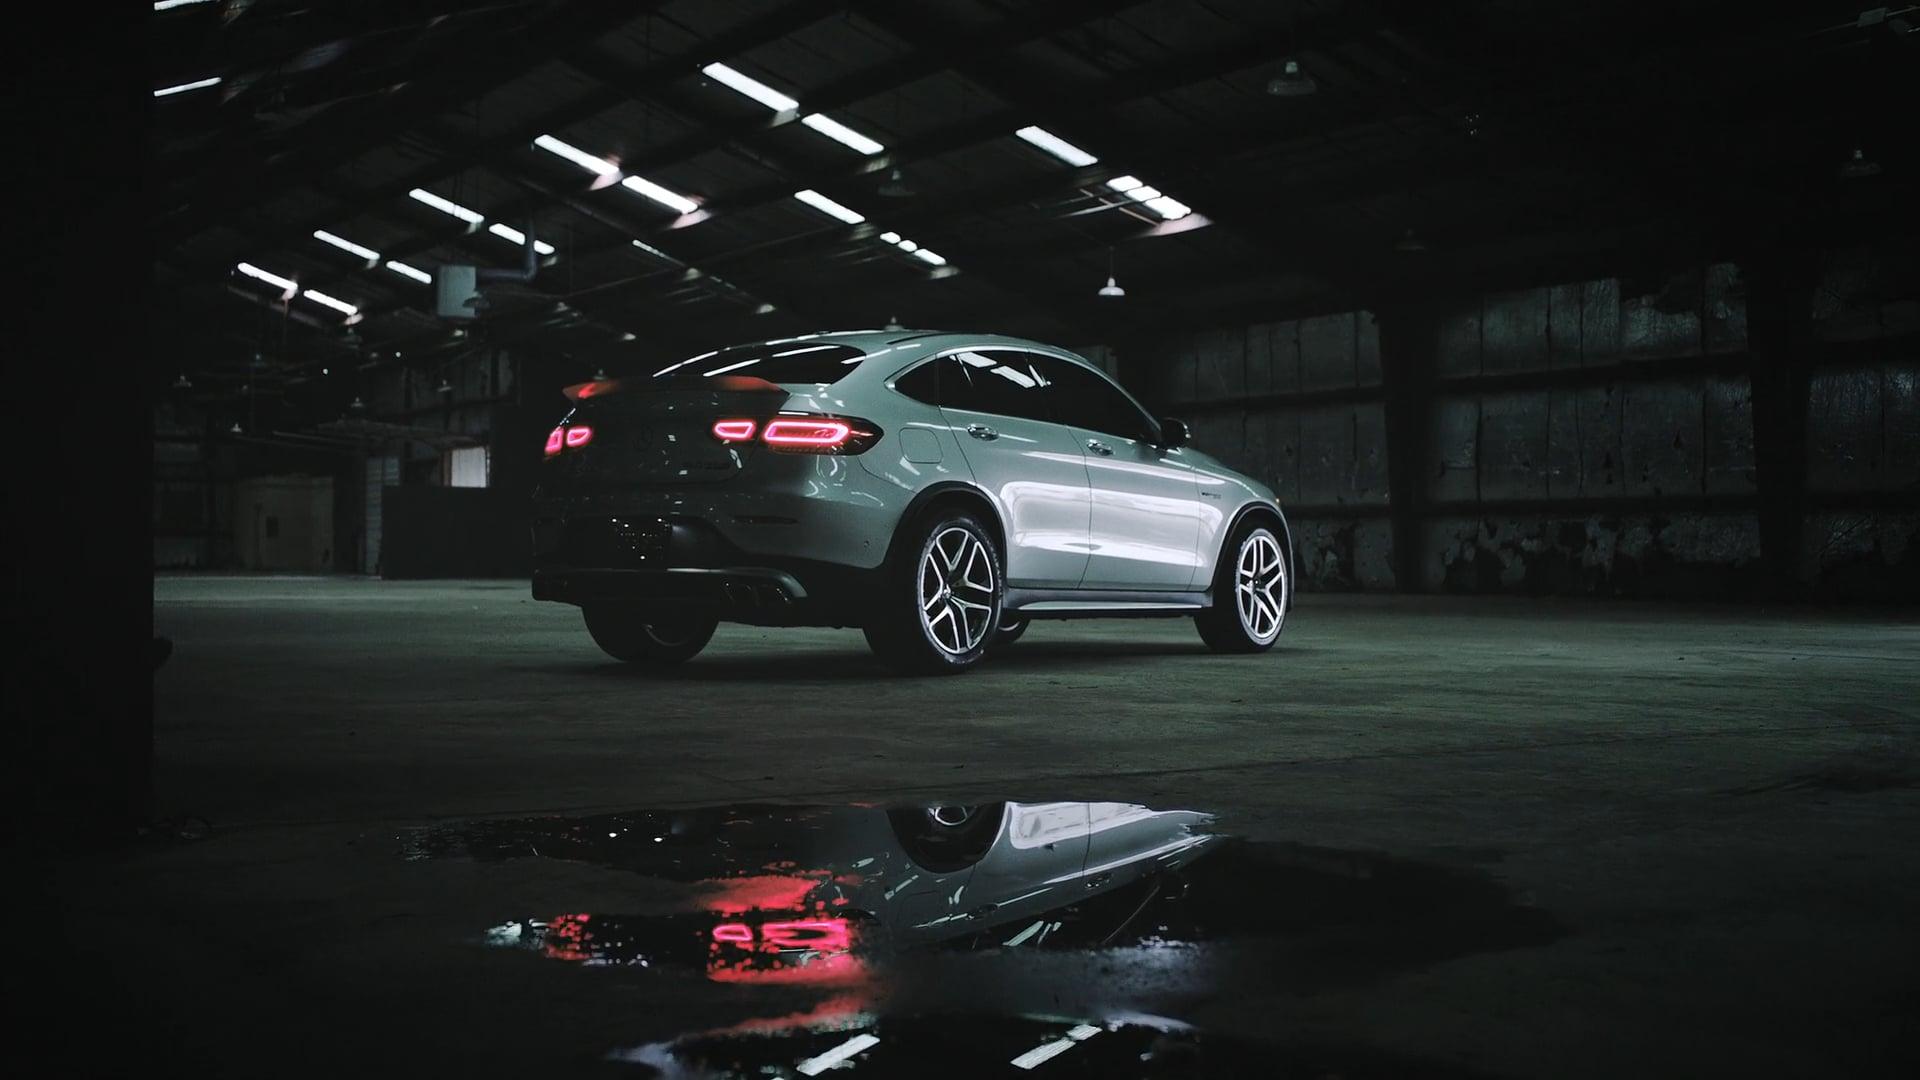 AMG - Performance